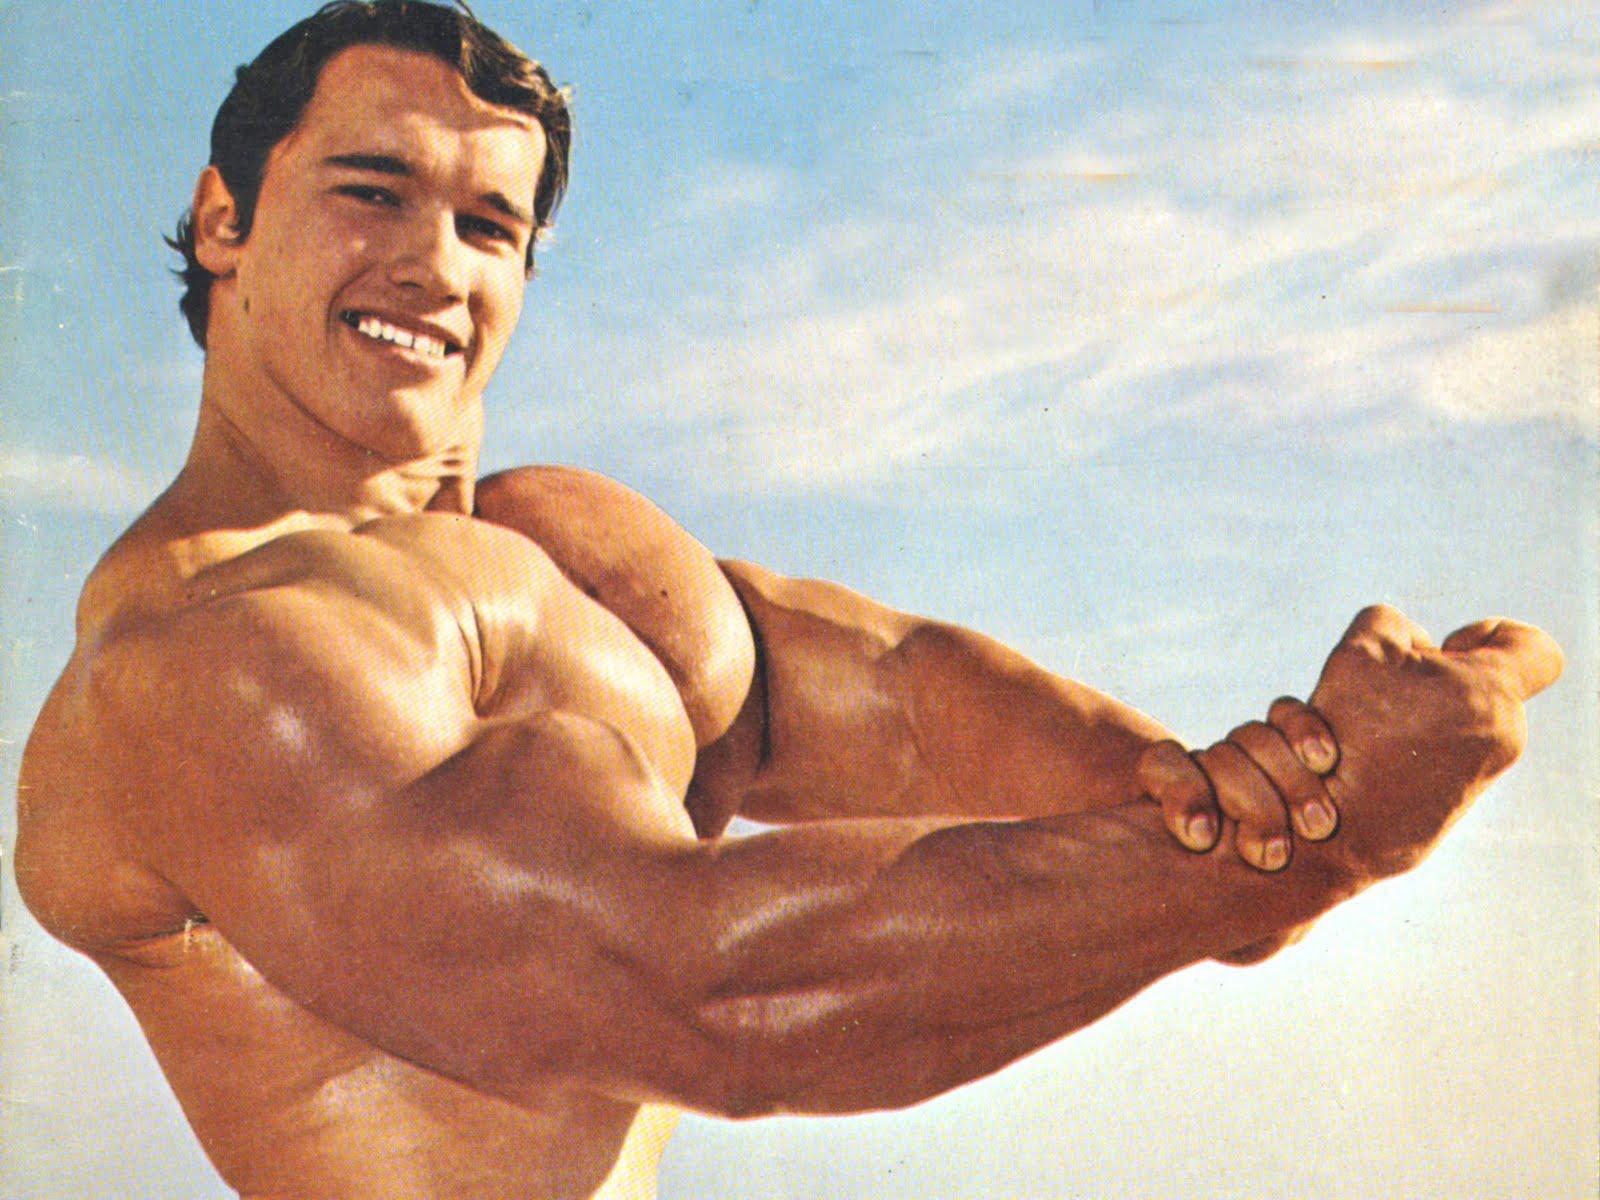 http://3.bp.blogspot.com/-40iKTtIOG9U/TdivkZqcaXI/AAAAAAAADfQ/zbgyPyODguA/s1600/Arnold+Schwarzenegger.jpg